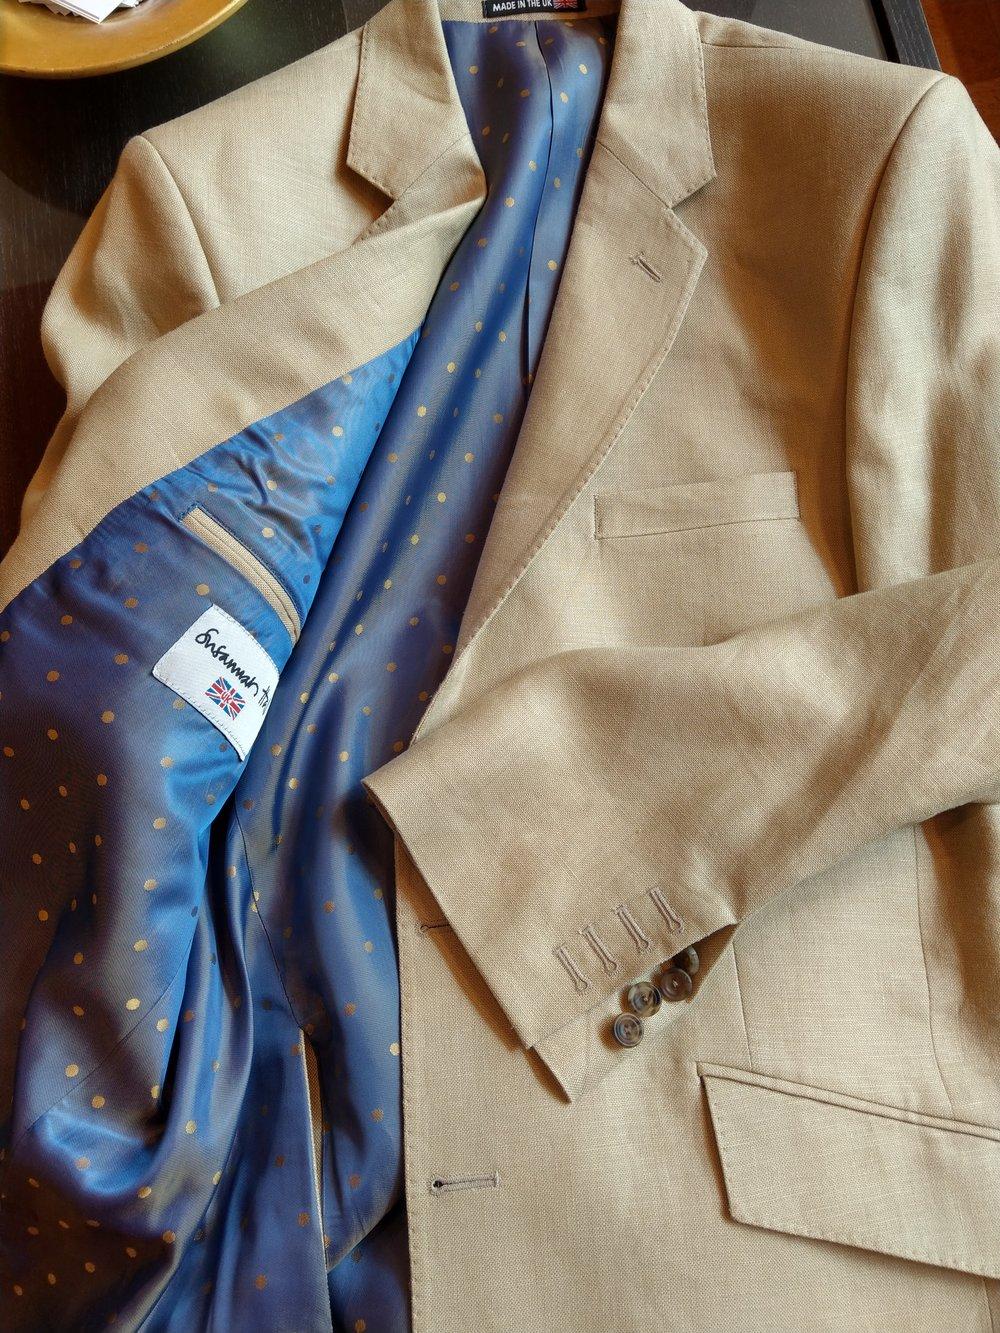 linen-jacket-bespoke-tailoring-susannah-hall-fabric-made-uk.jpg